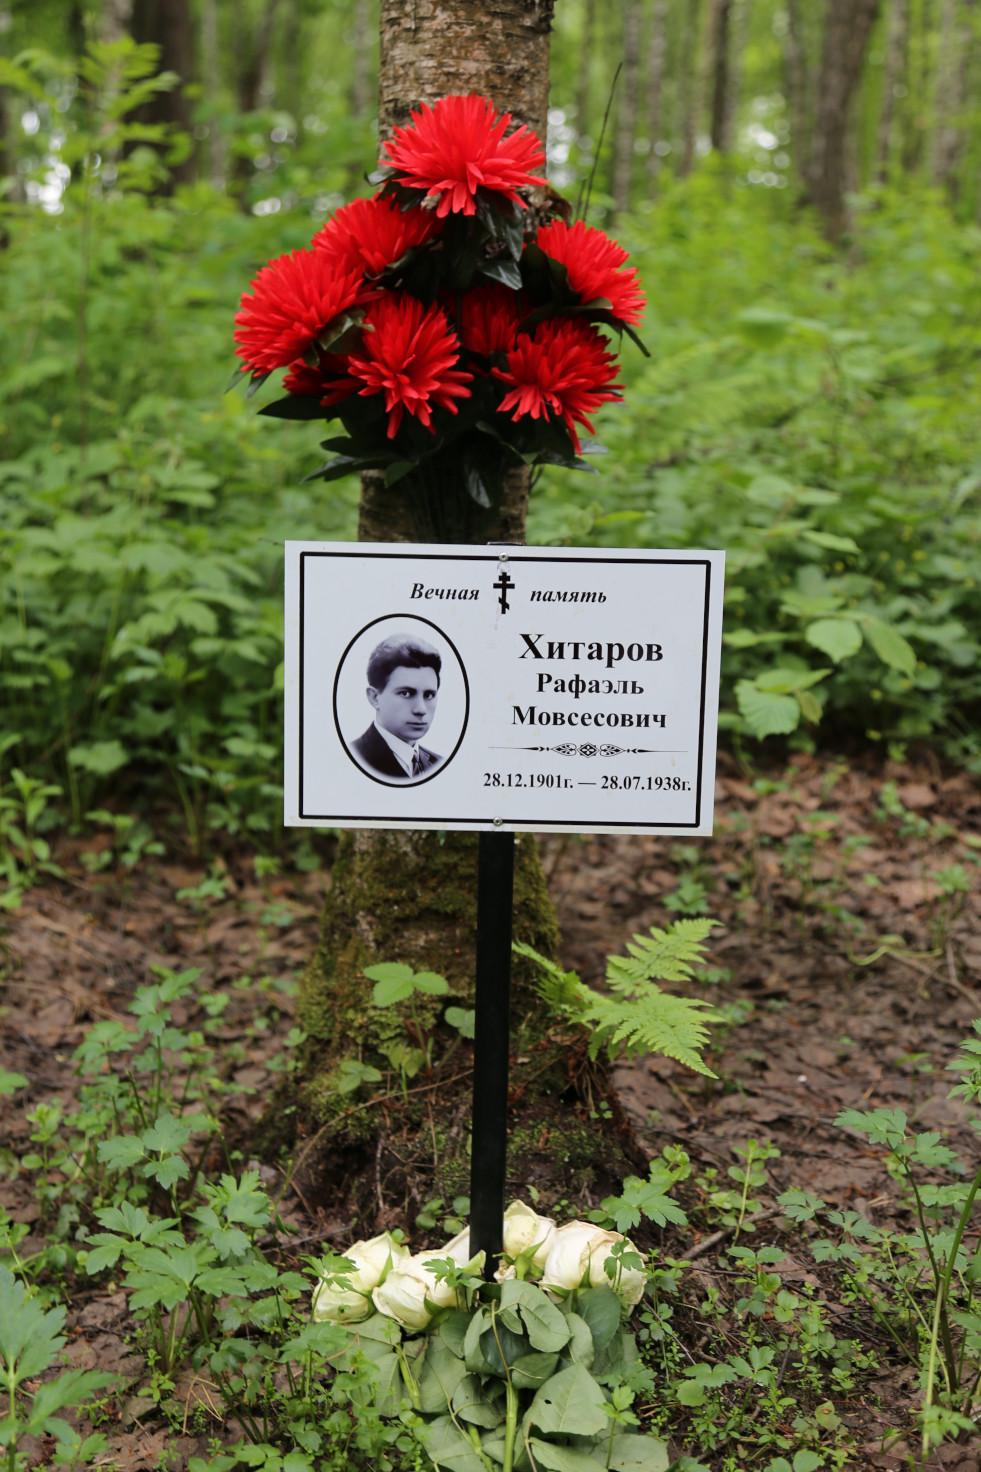 Памятная табличка Р.М. Хитарову. Фото 07.06.2018